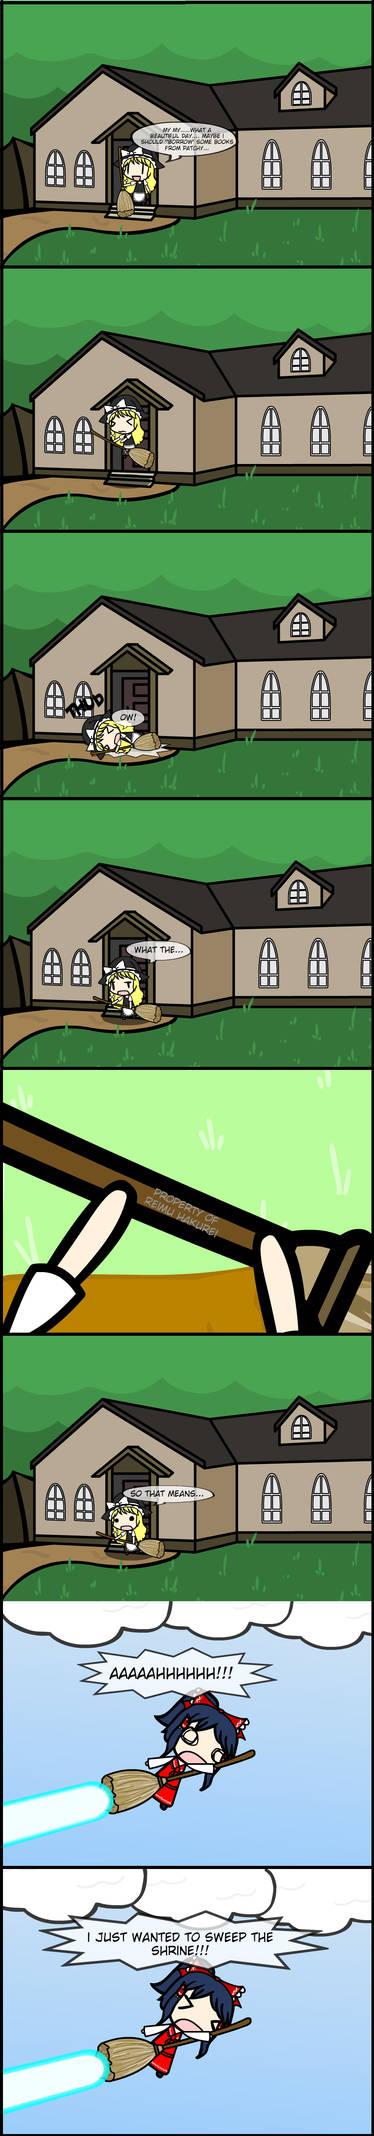 Broom Problems